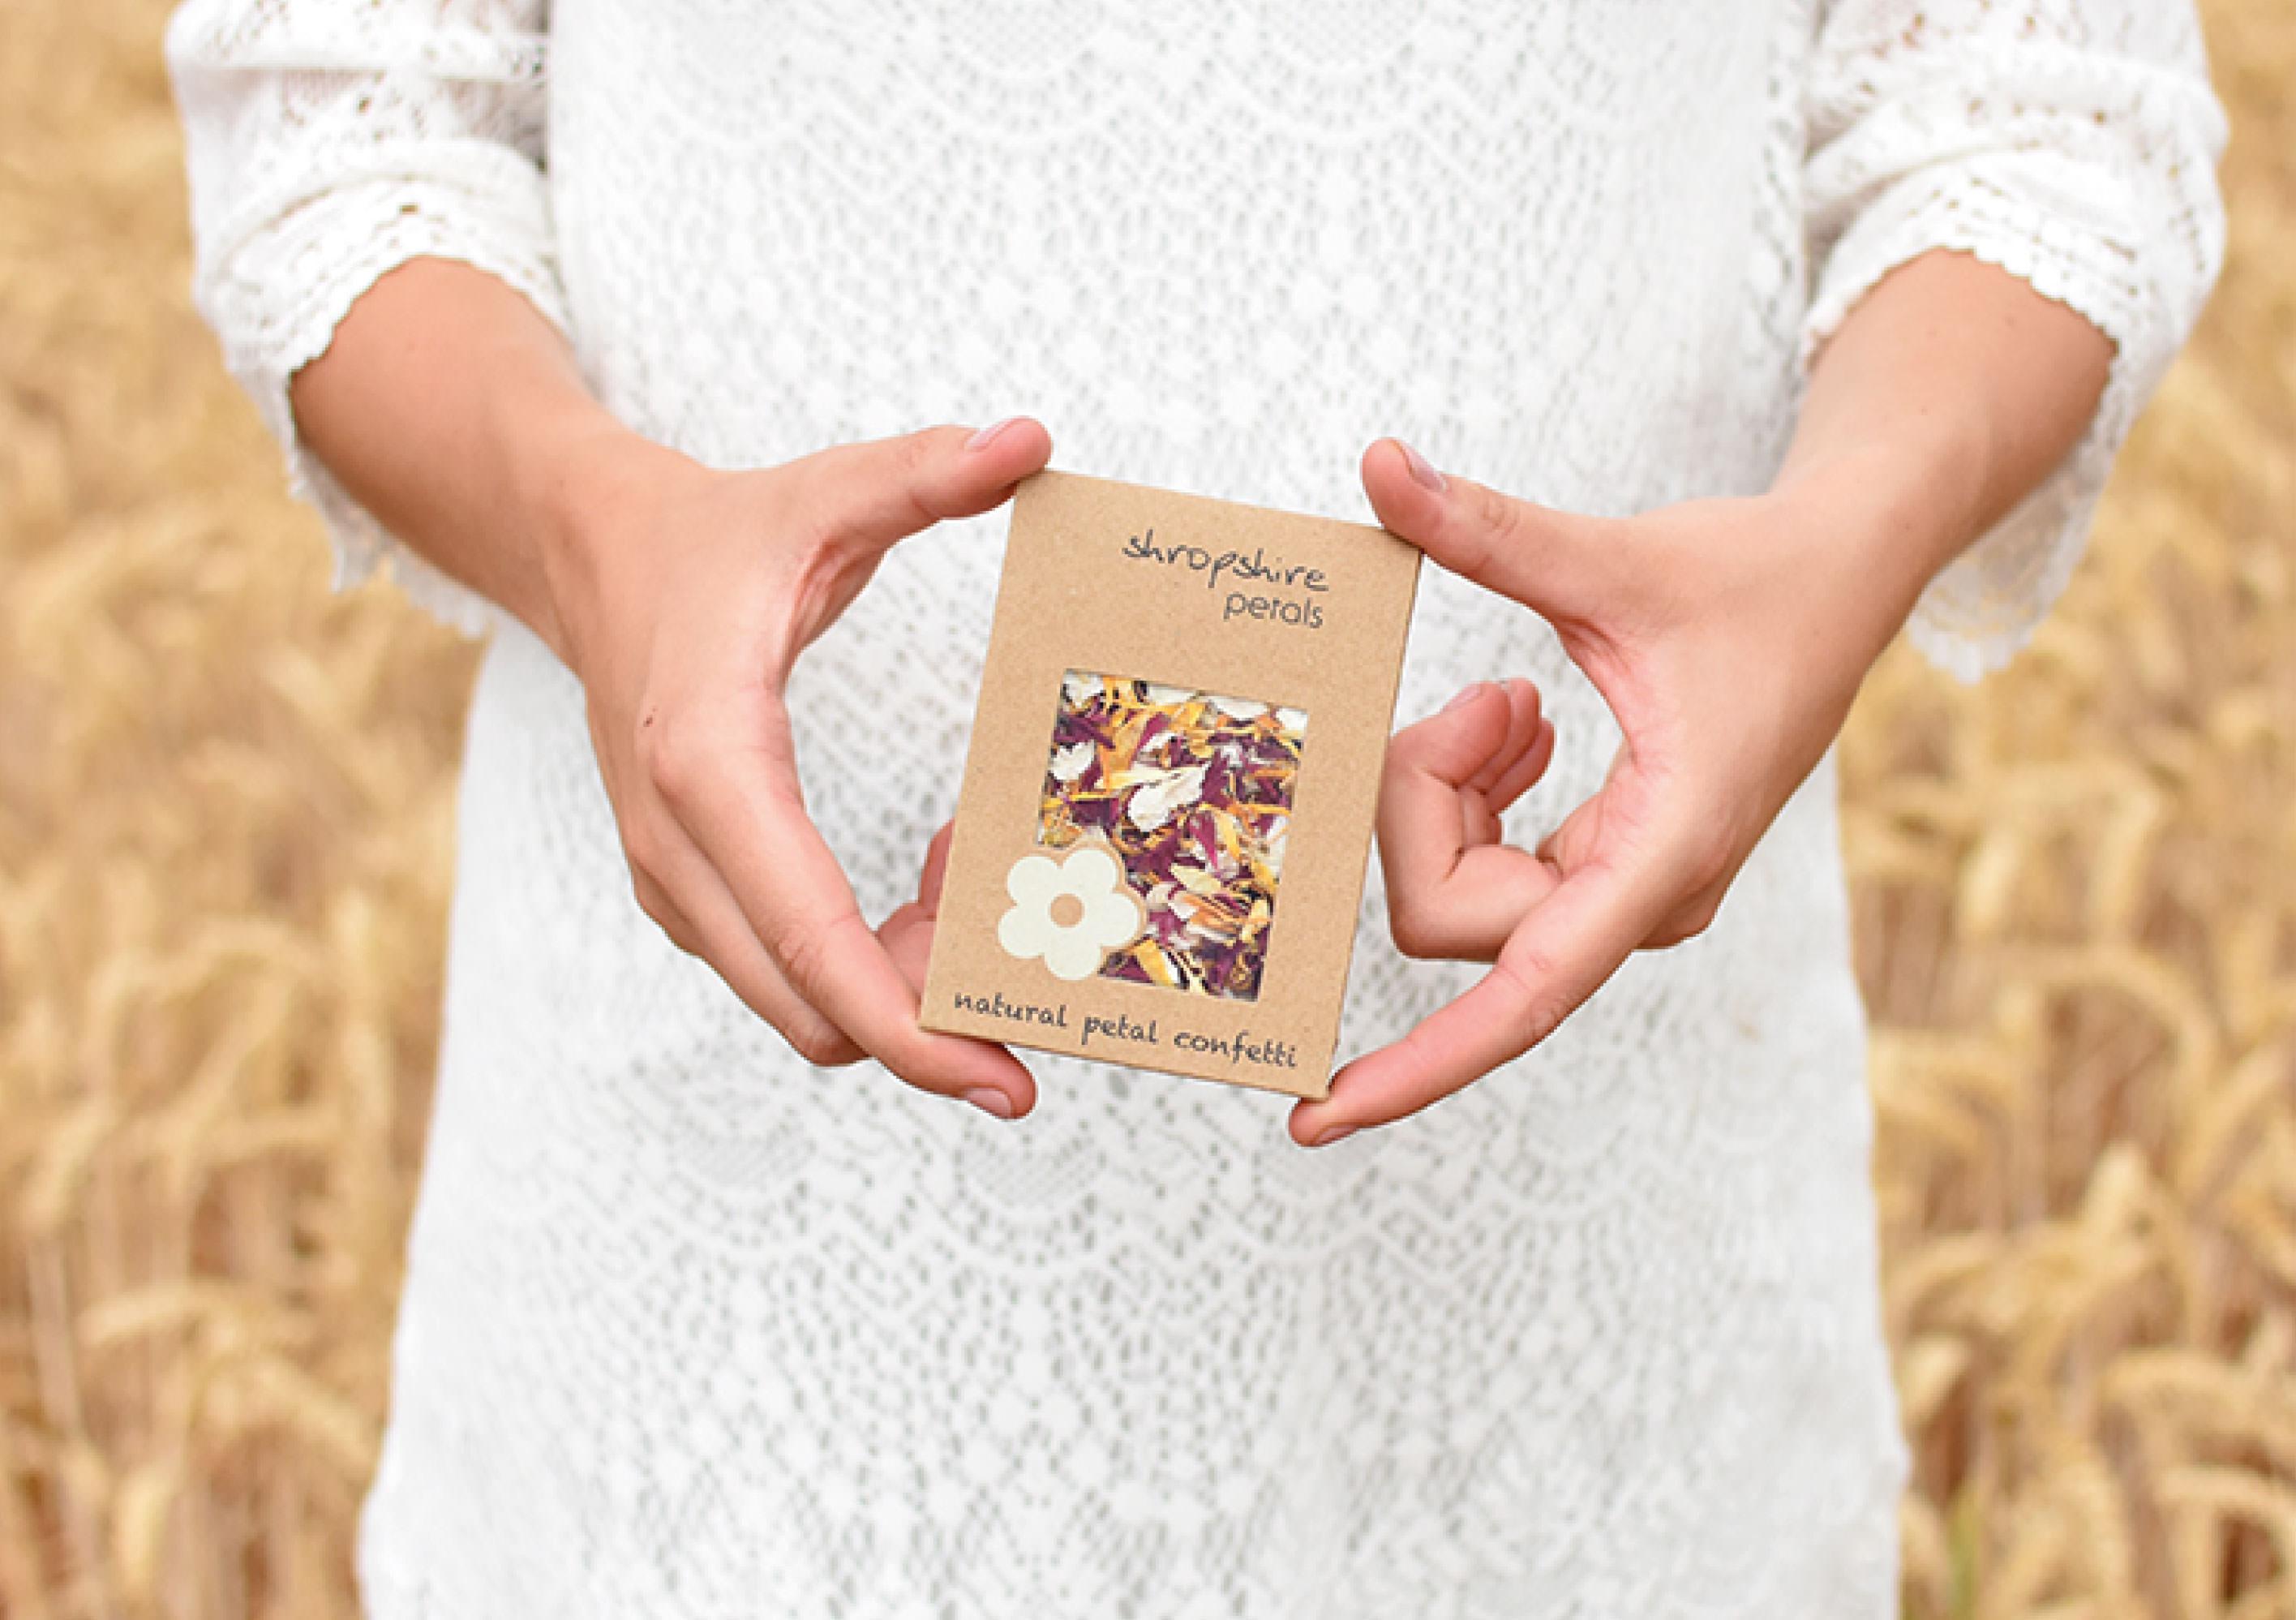 shropshire-petals-packaging